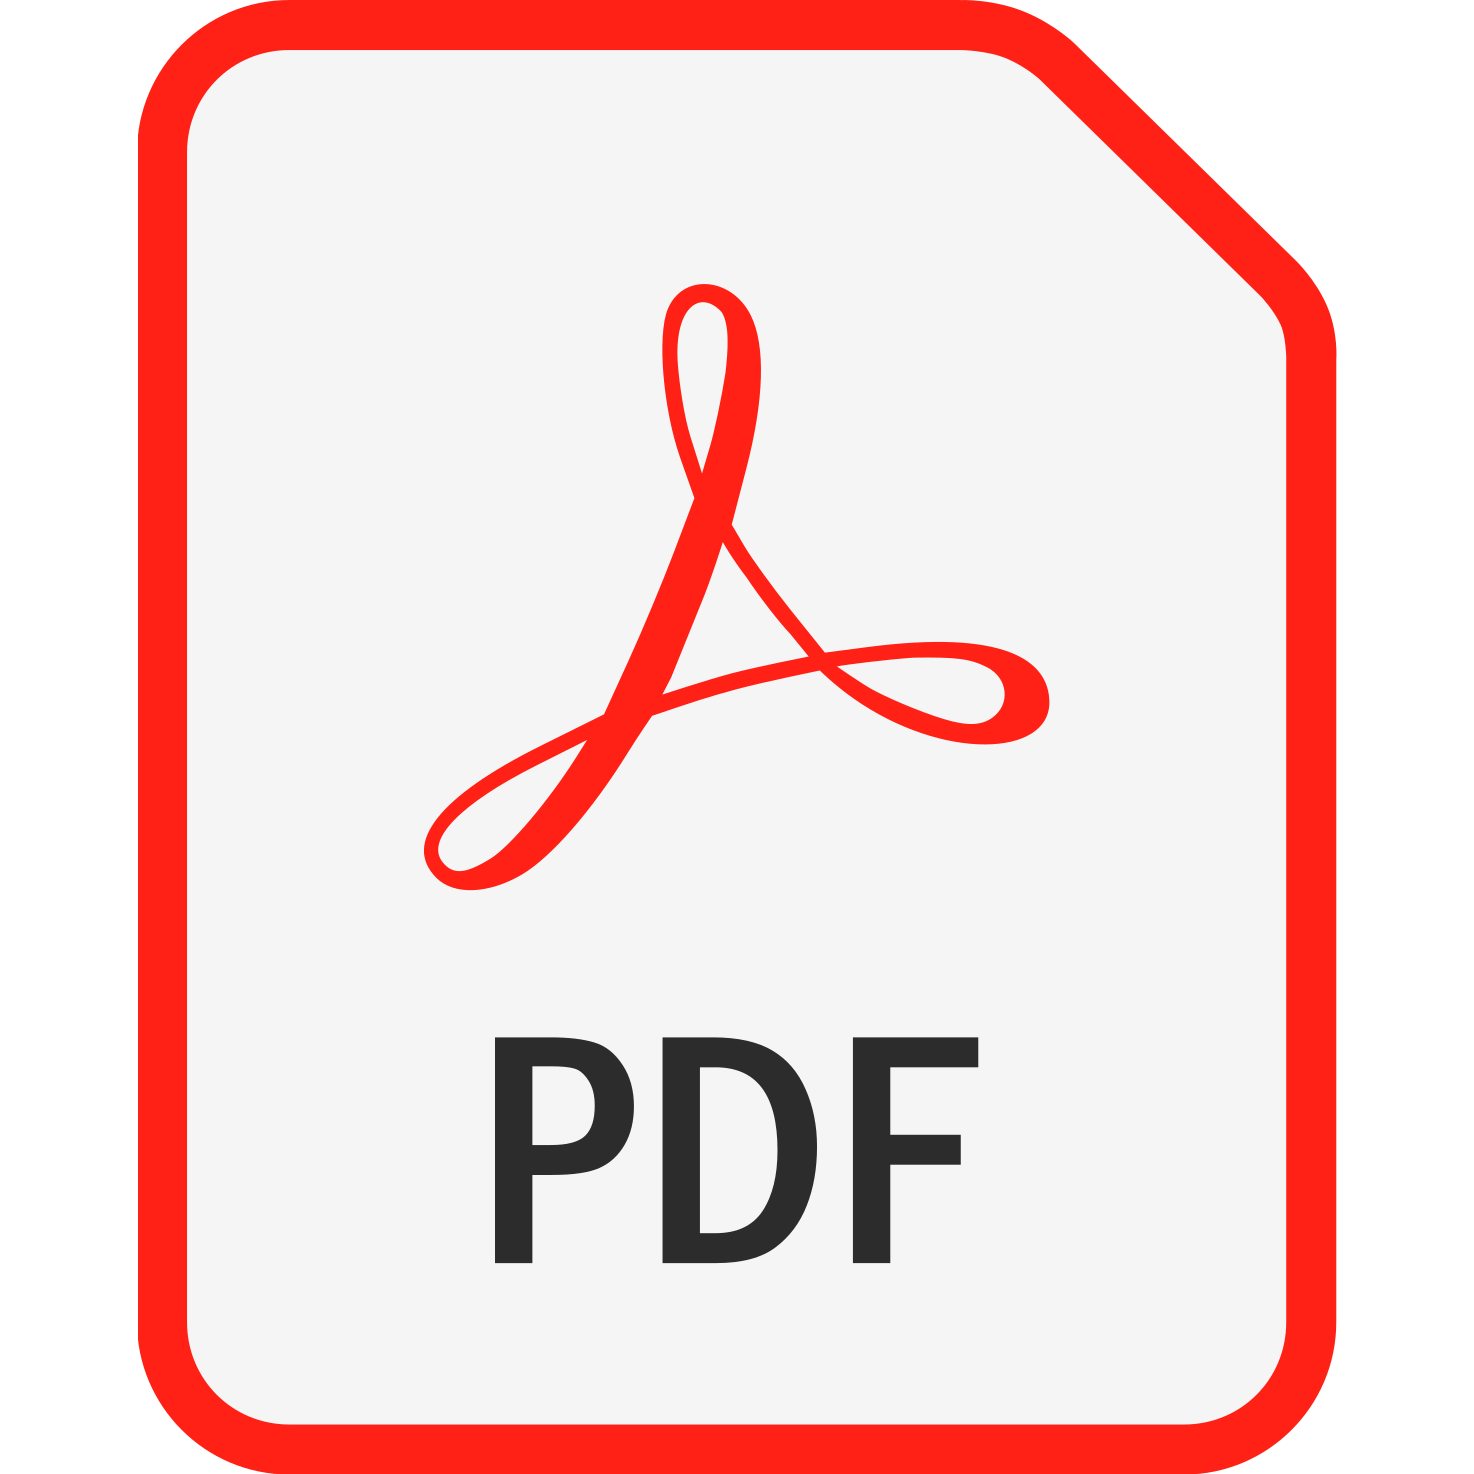 pdf-square-logo.png